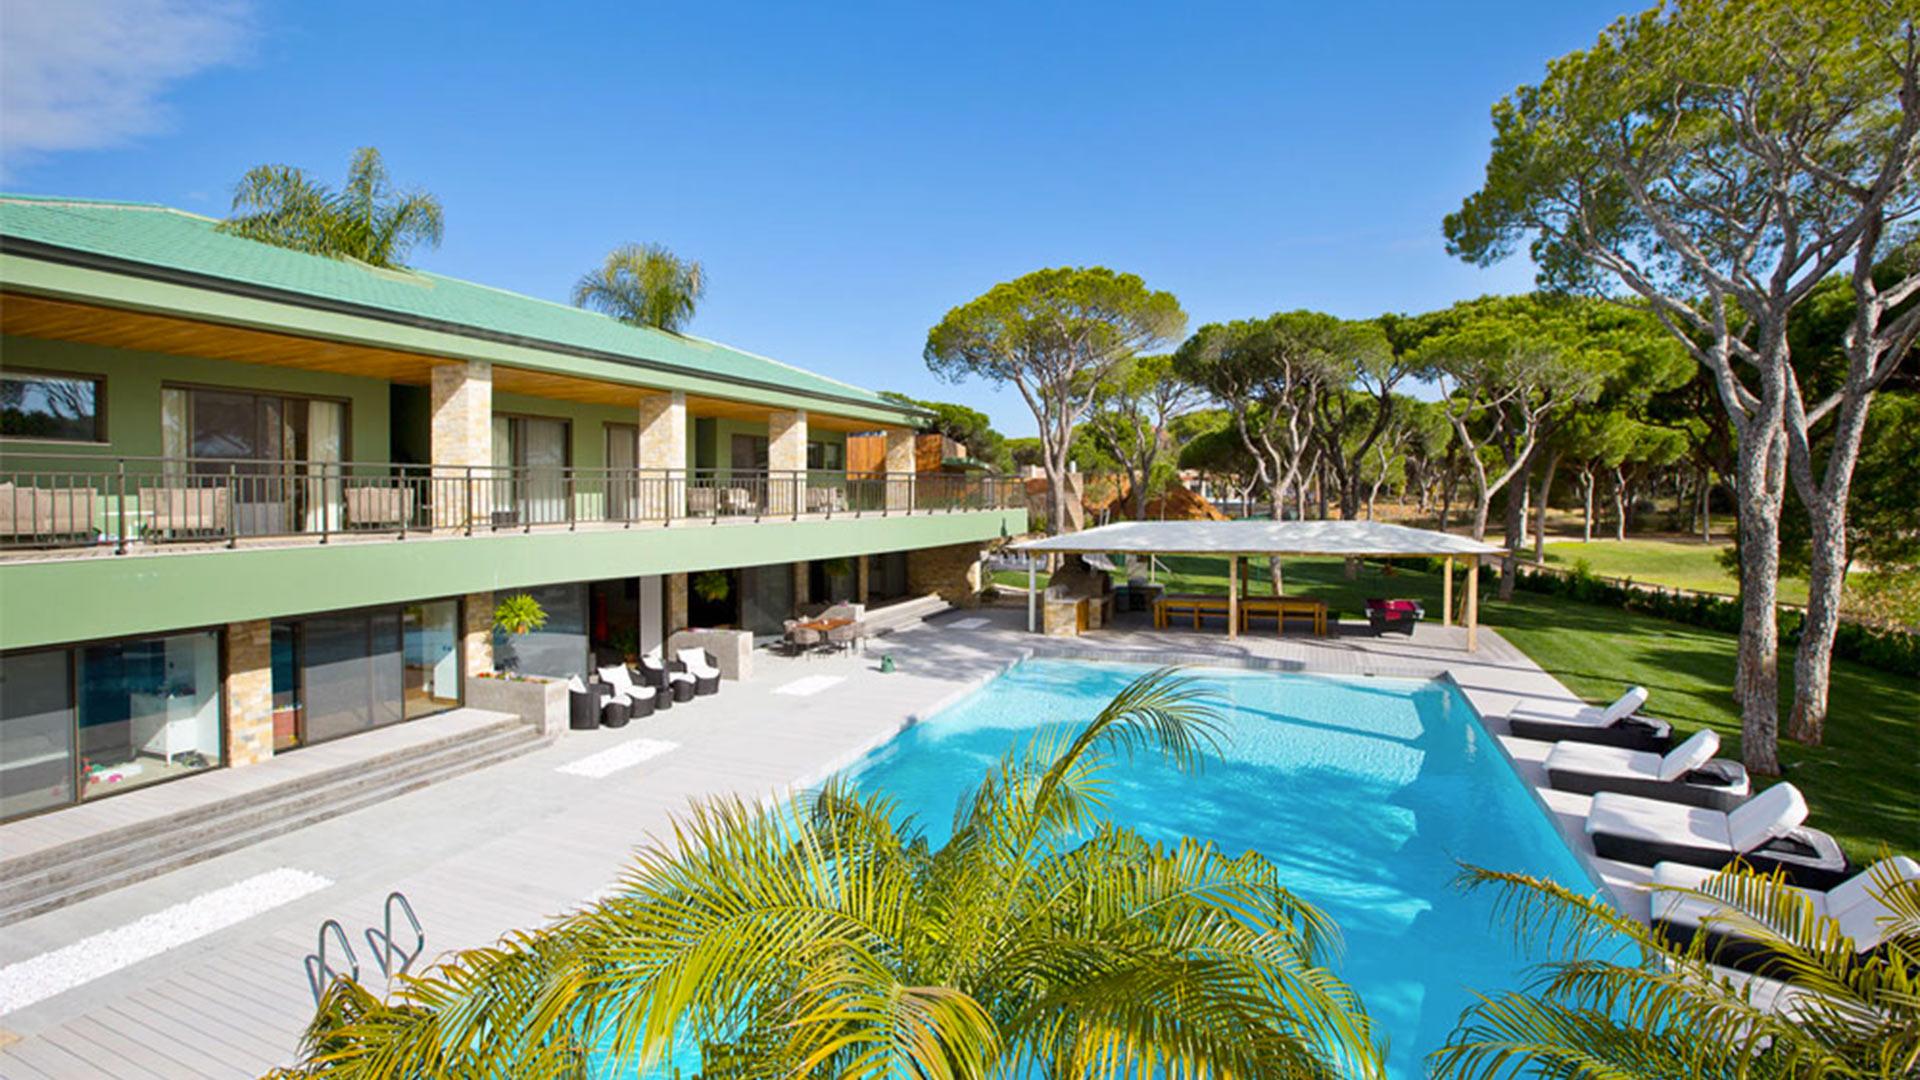 villa 36 villa mieten in algarve vilamoura villanovo. Black Bedroom Furniture Sets. Home Design Ideas